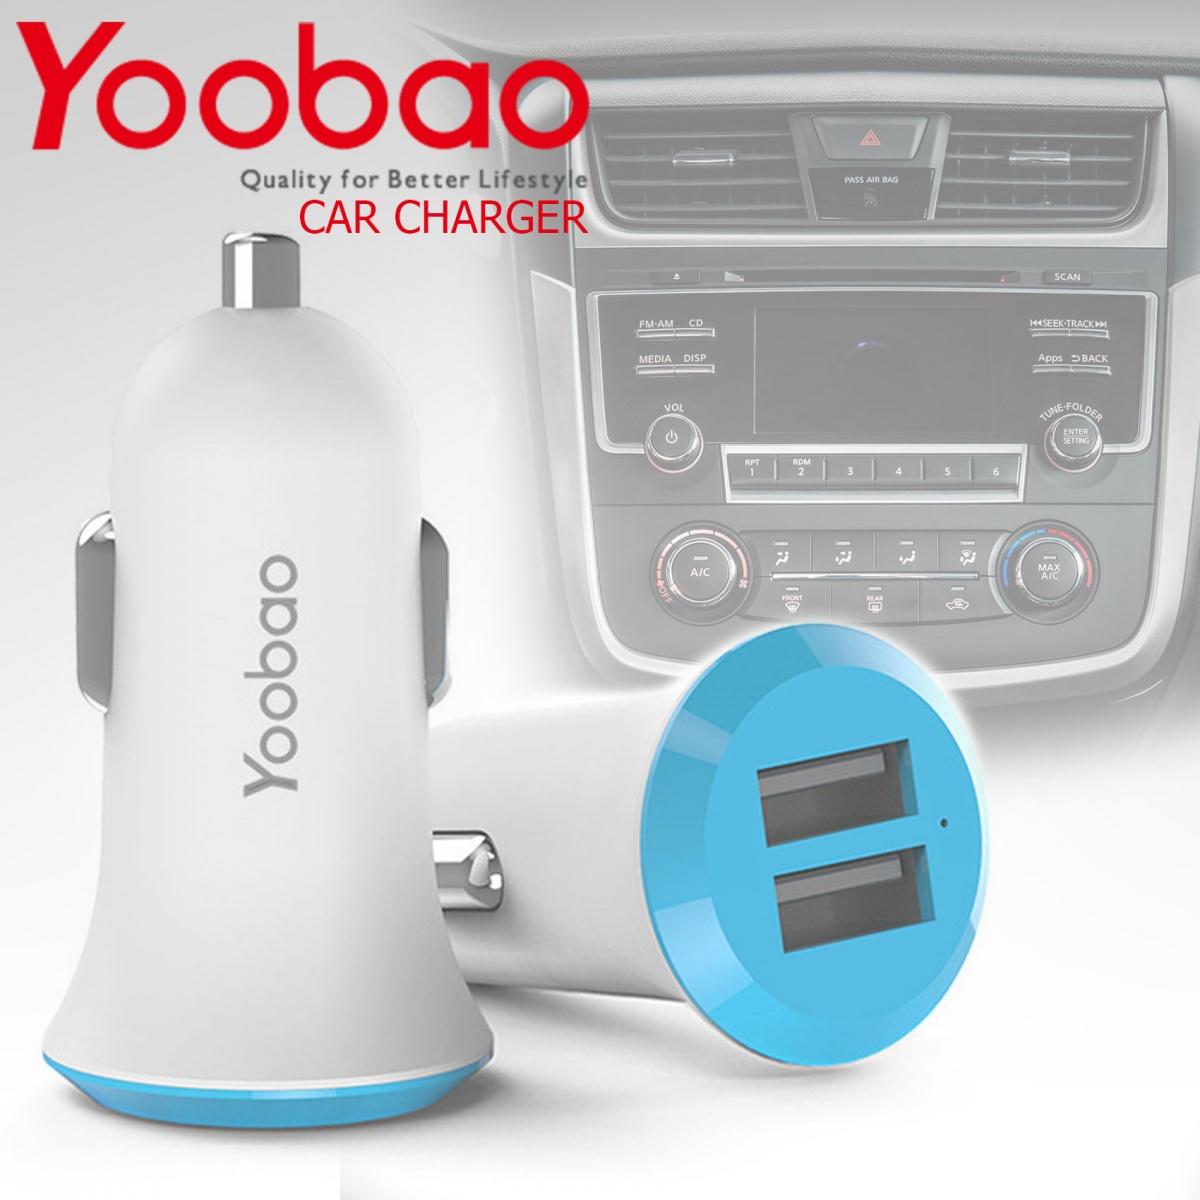 Yoobao YB205 2 Port Car Charger - Blue